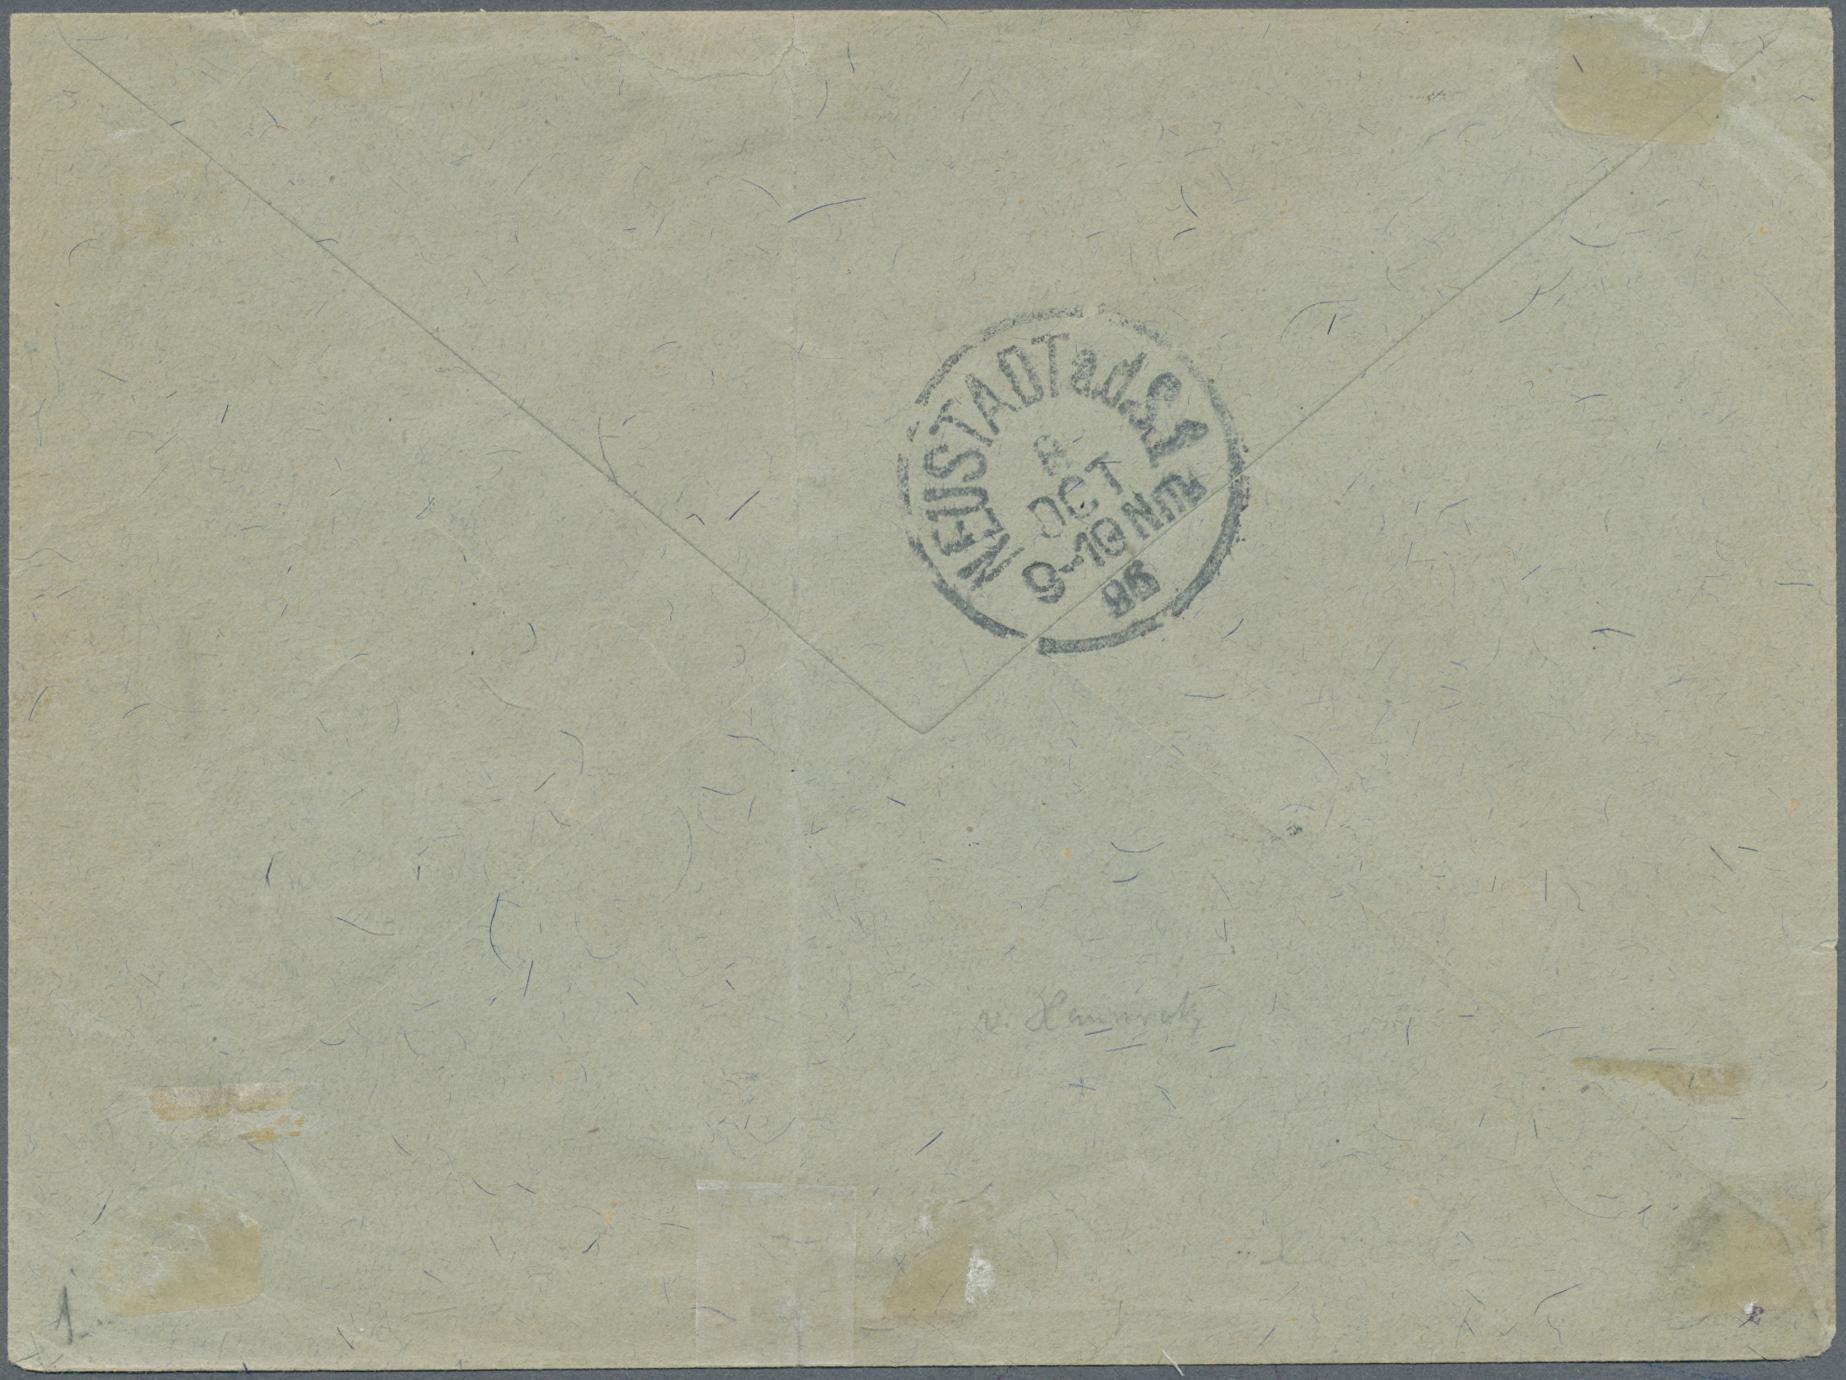 Lot 18756 - Deutsche Kolonien - Marshall-Inseln - Vorläufer  -  Auktionshaus Christoph Gärtner GmbH & Co. KG Auction #40 Germany, Picture Post Cards, Collections Overseas, Thematics